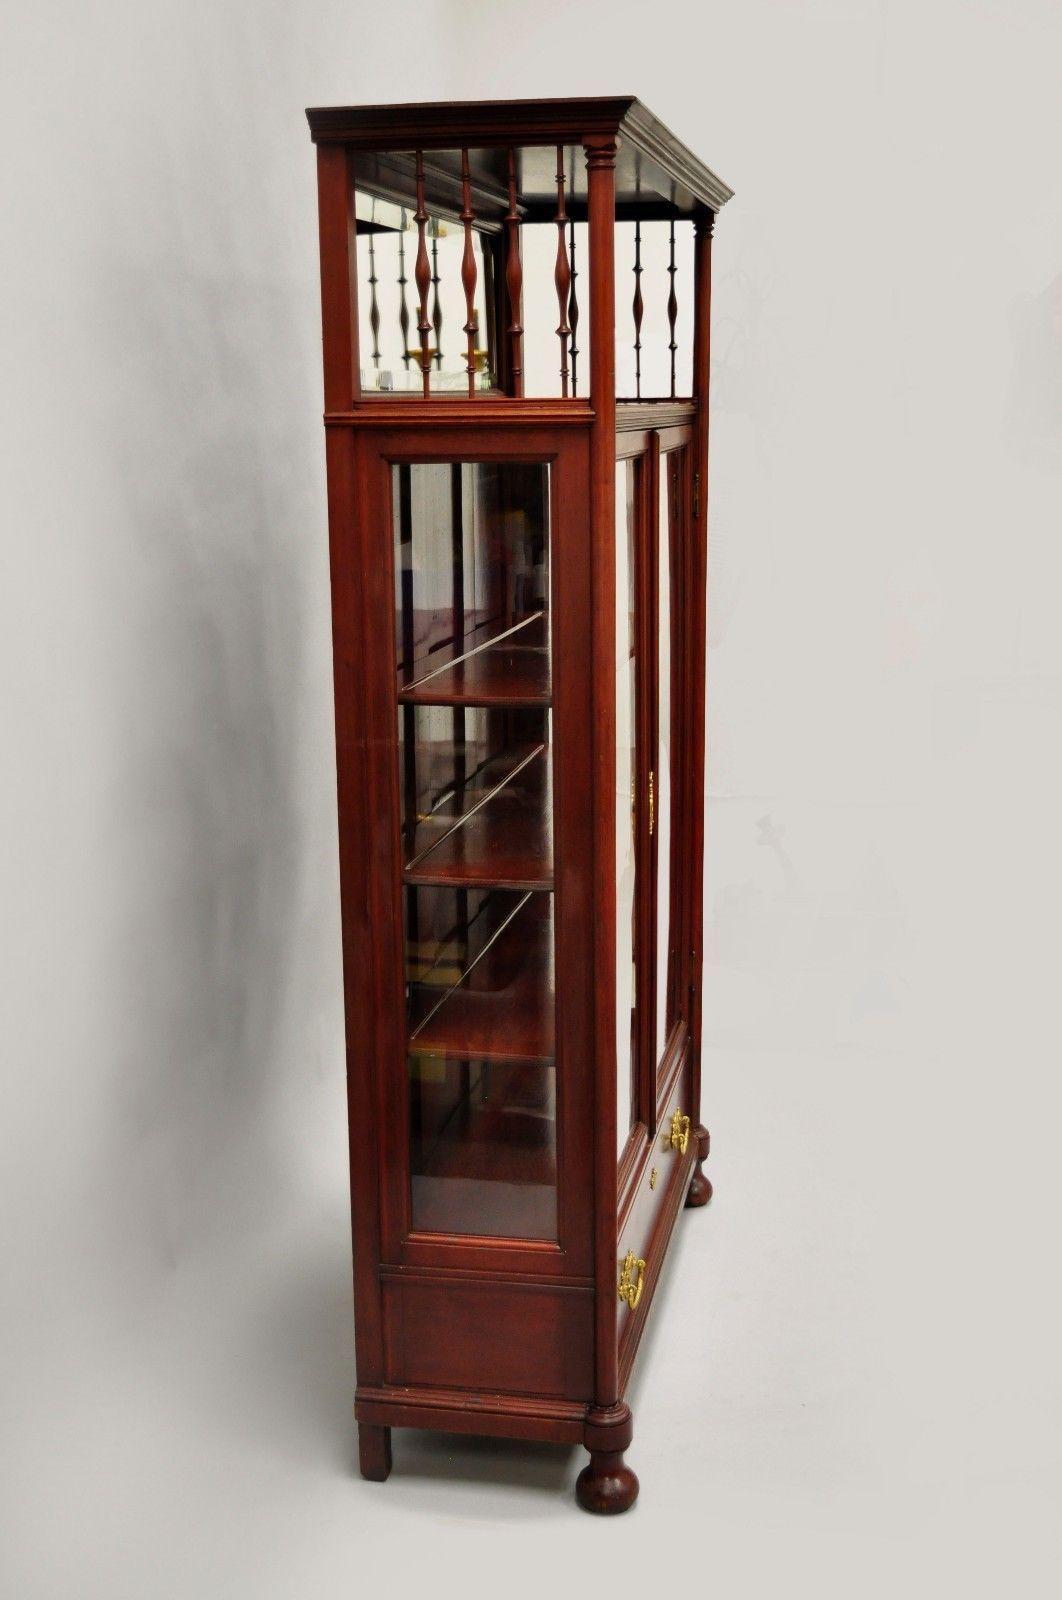 Antique Victorian Two Door Mahogany U0026 Glass Bookcase Curio Cabinet Display  Shelf For Sale 7